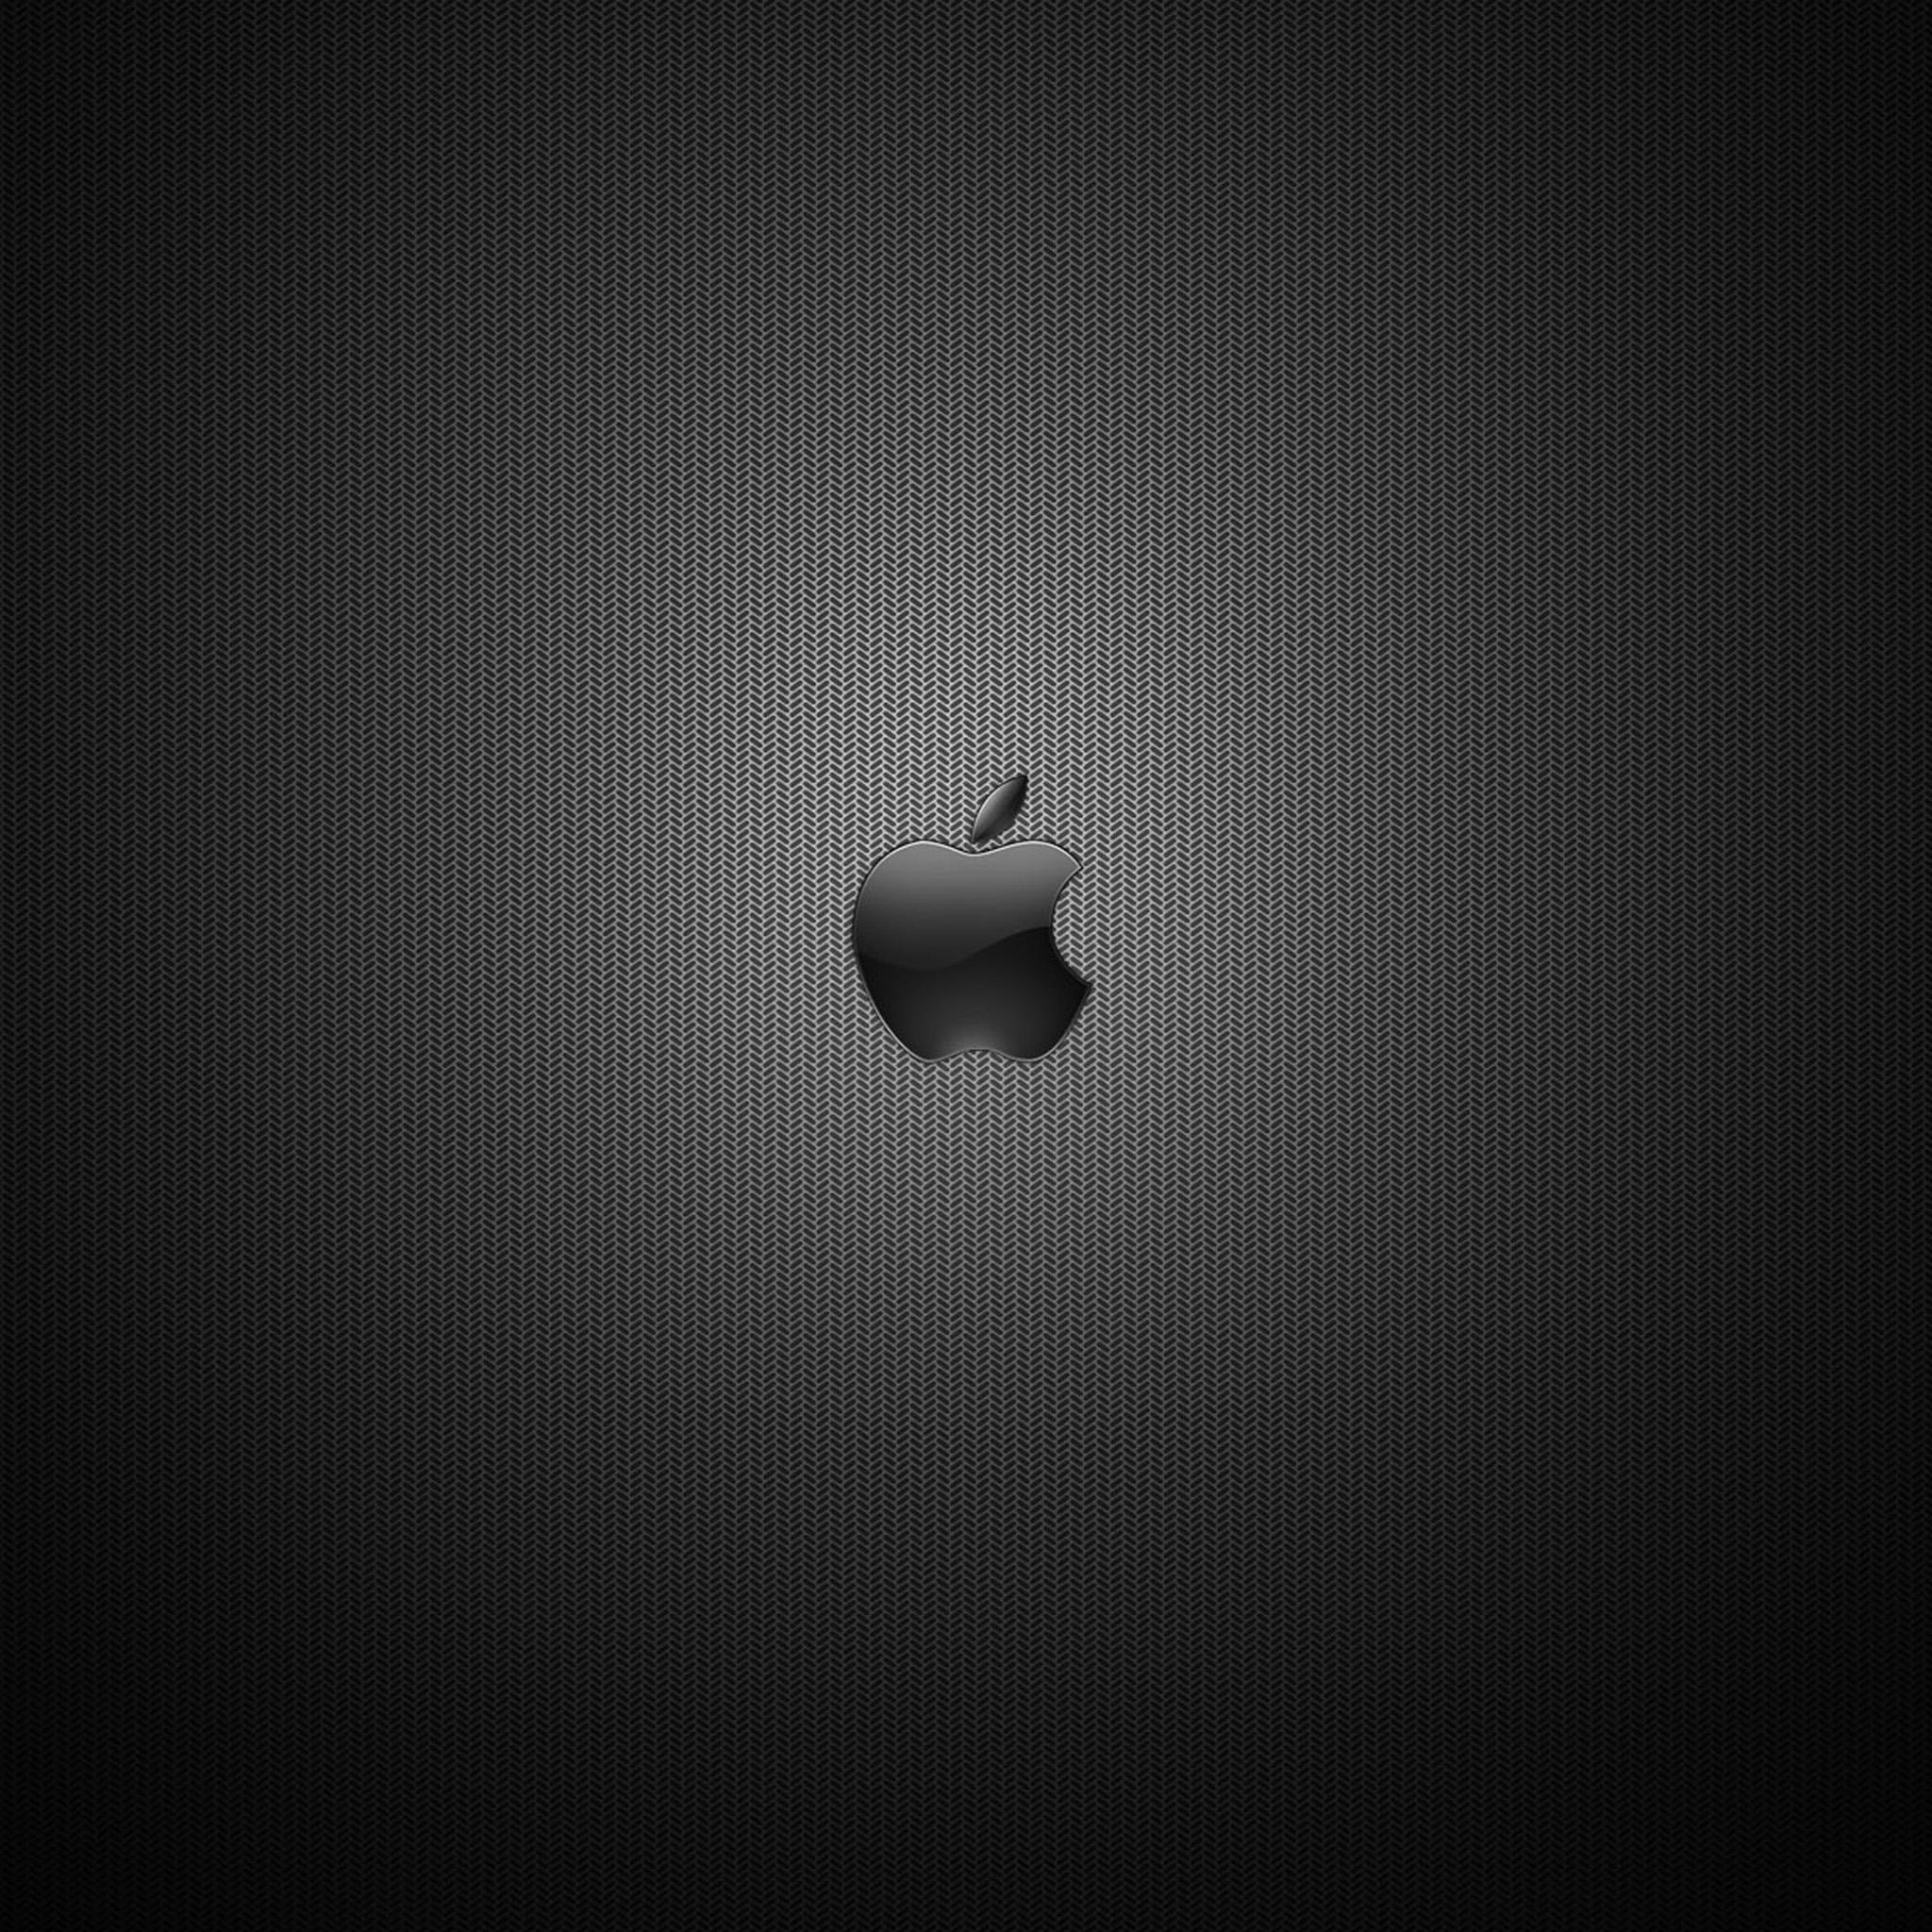 Filename: iPad-retina-wallpaper-Apple-Logo-HD_77.jpg